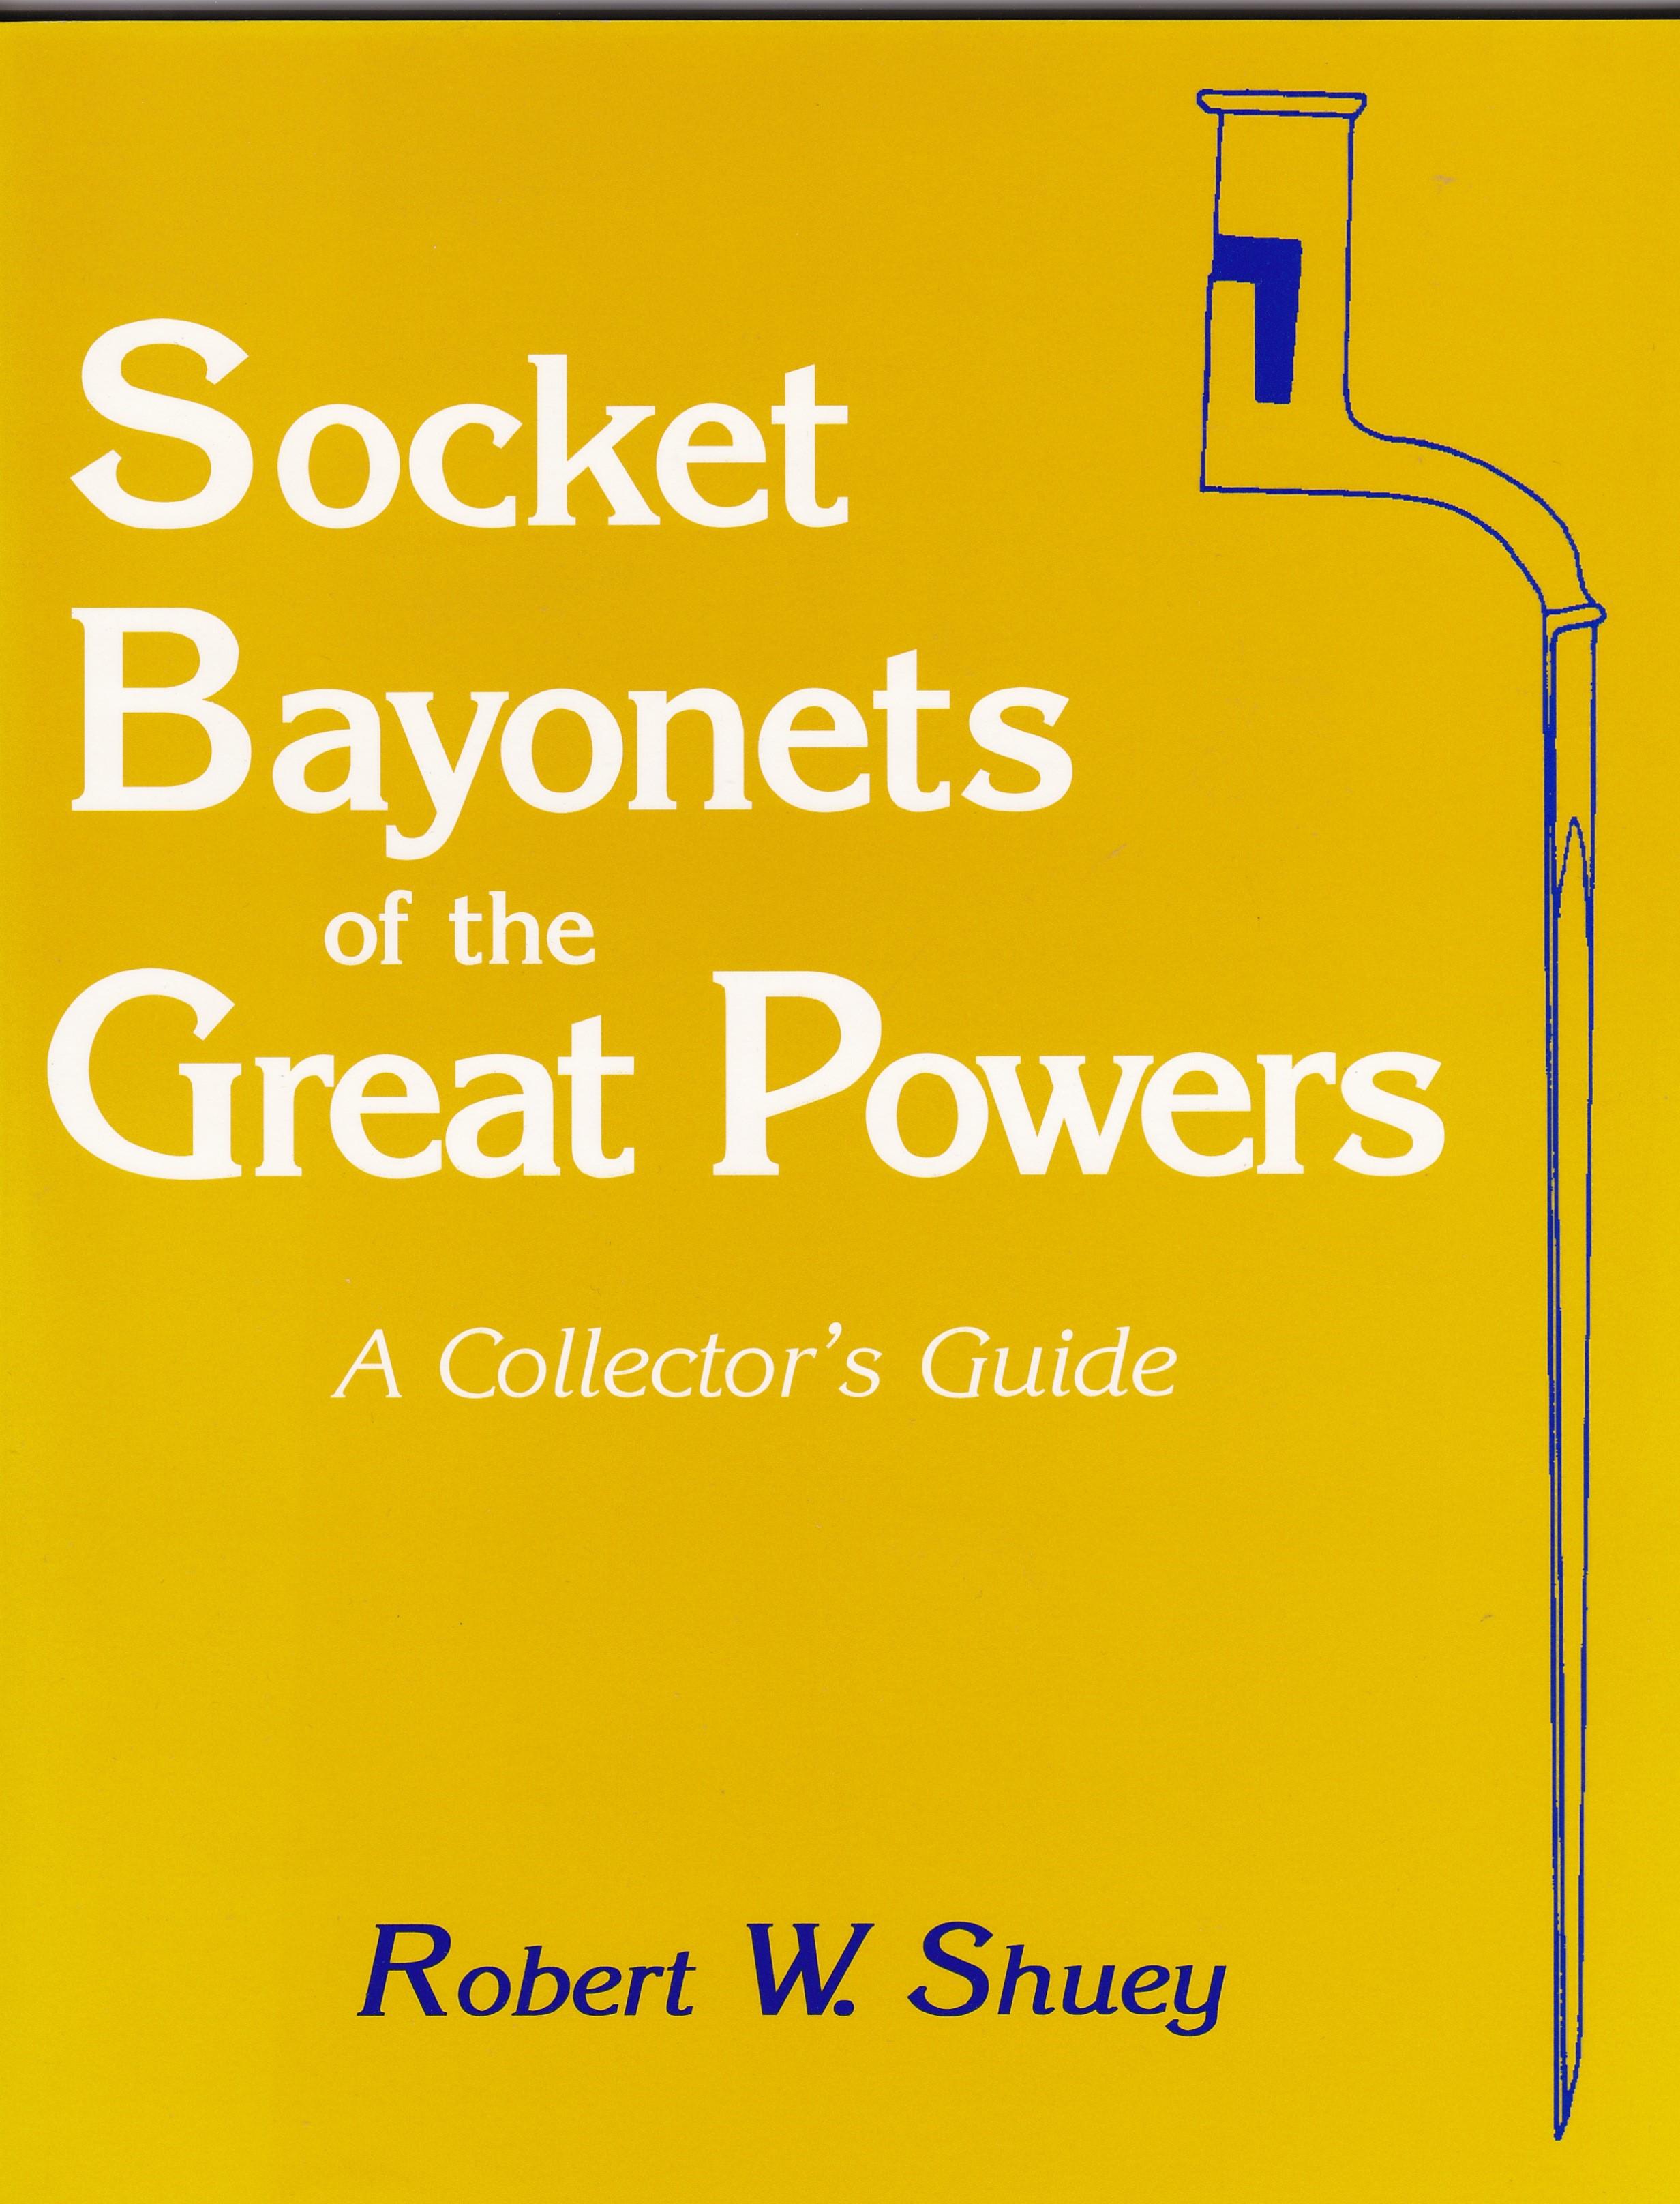 Socket Bayonets Of the Great Powers #848.2